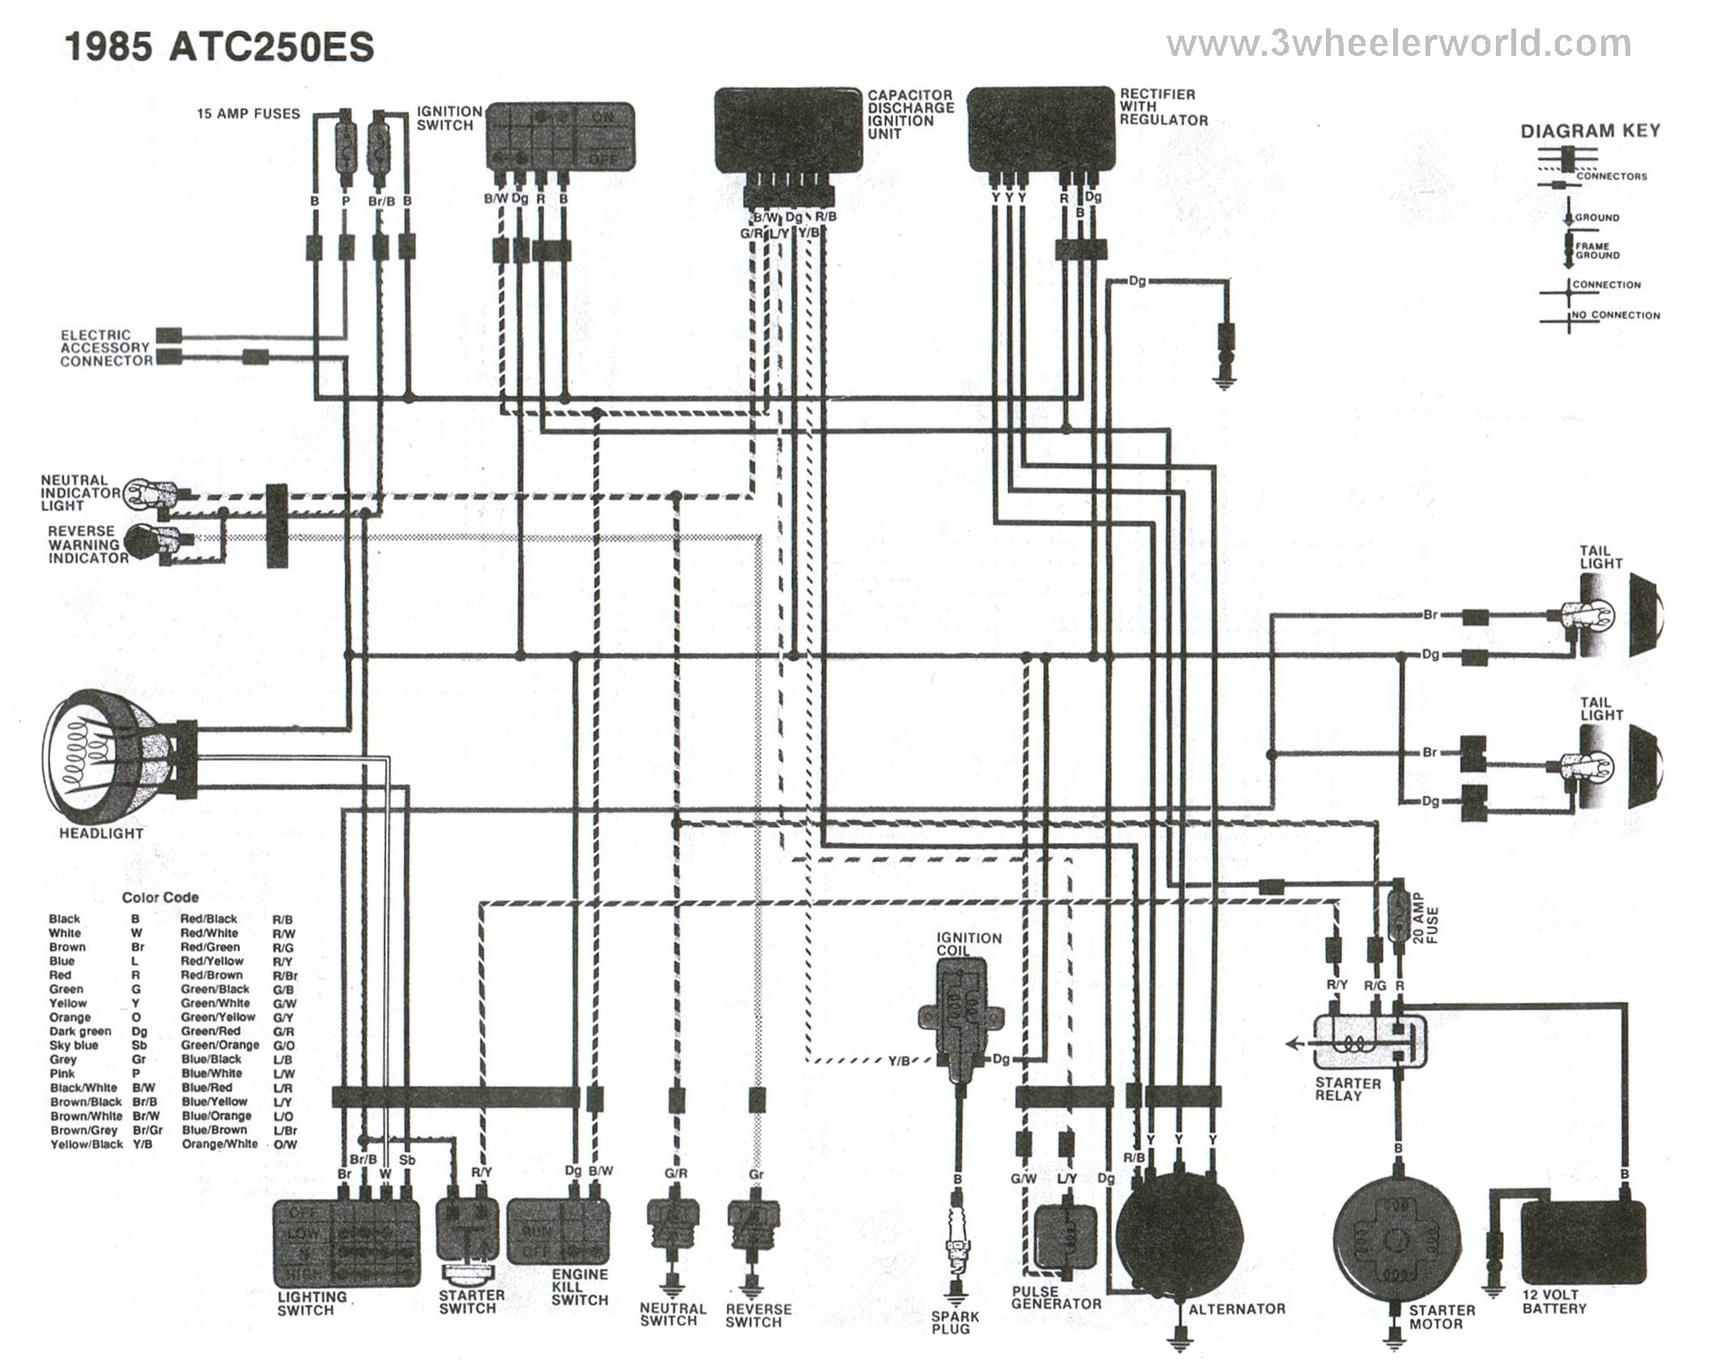 yamaha atv wiring diagram yamaha image wiring diagram yamaha moto 4 wiring diagram wiring diagram and hernes on yamaha atv wiring diagram